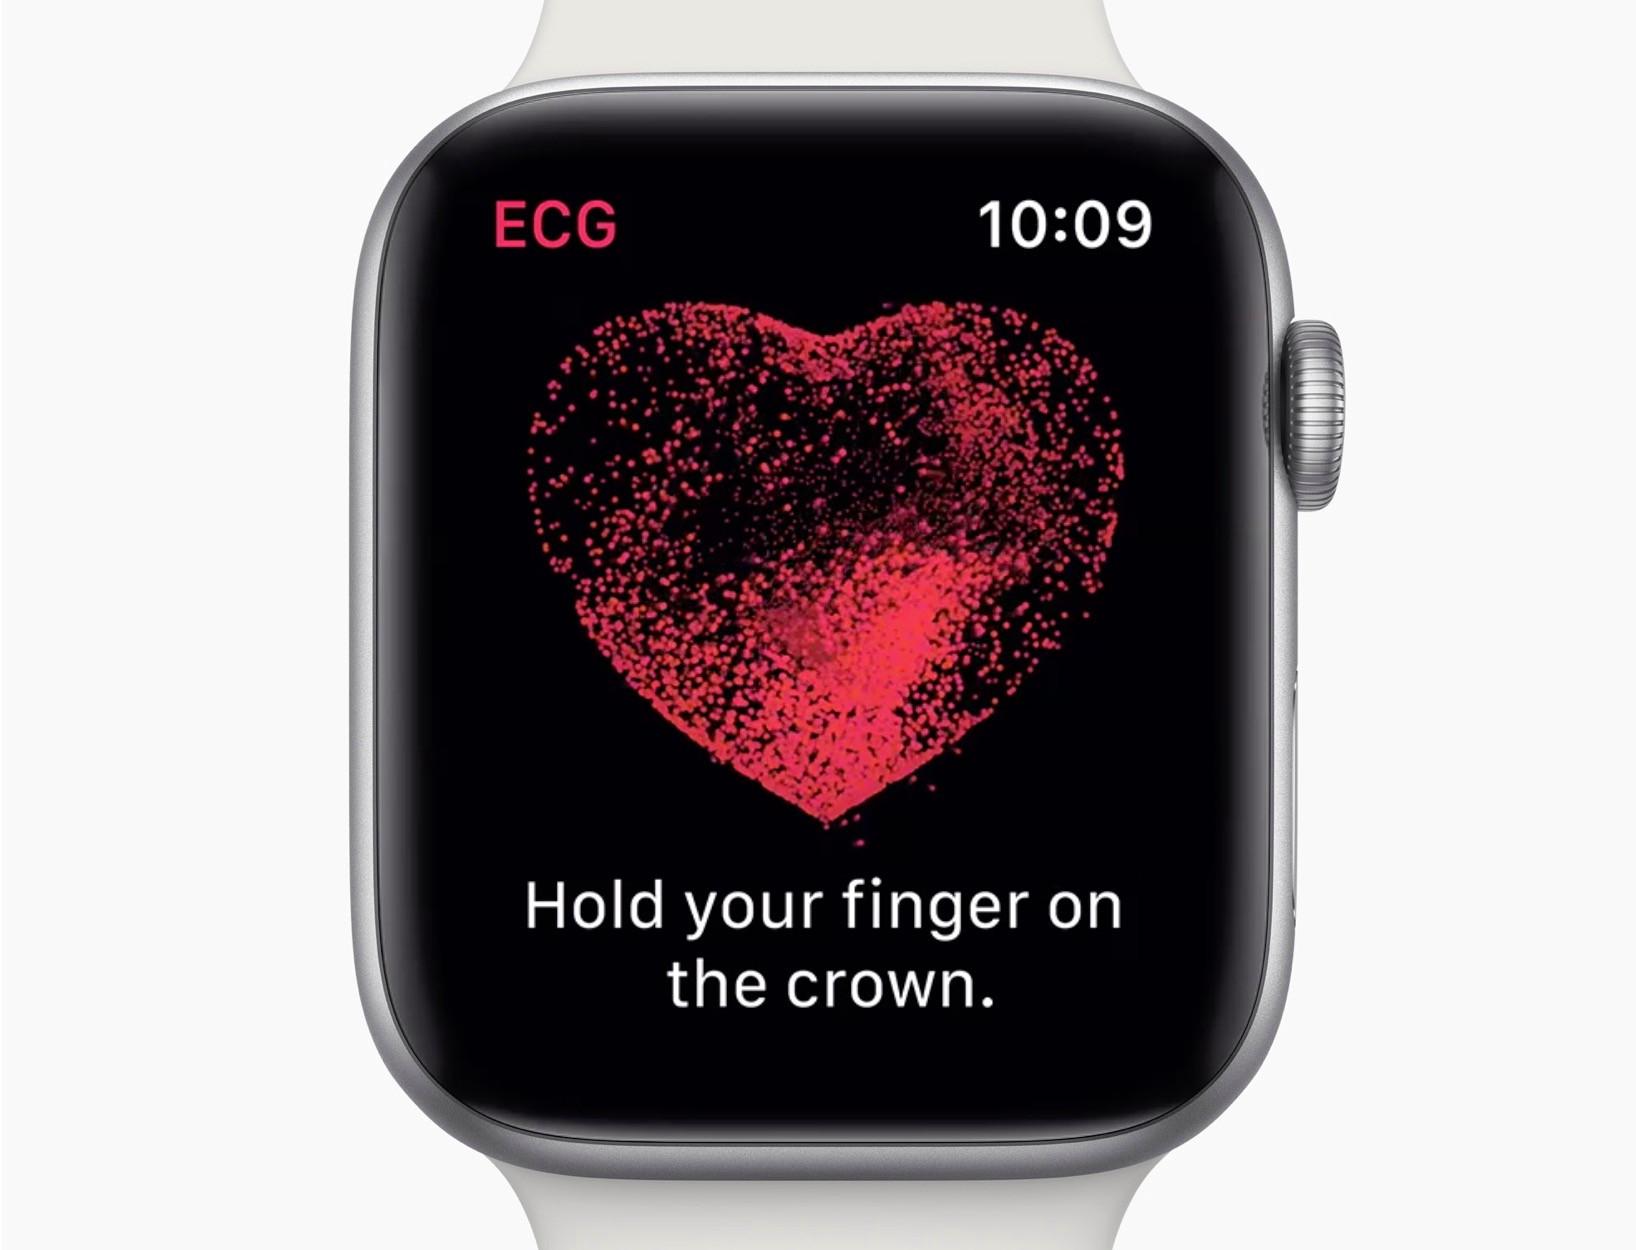 Apple prepares to release ECG app for Watch Series 4